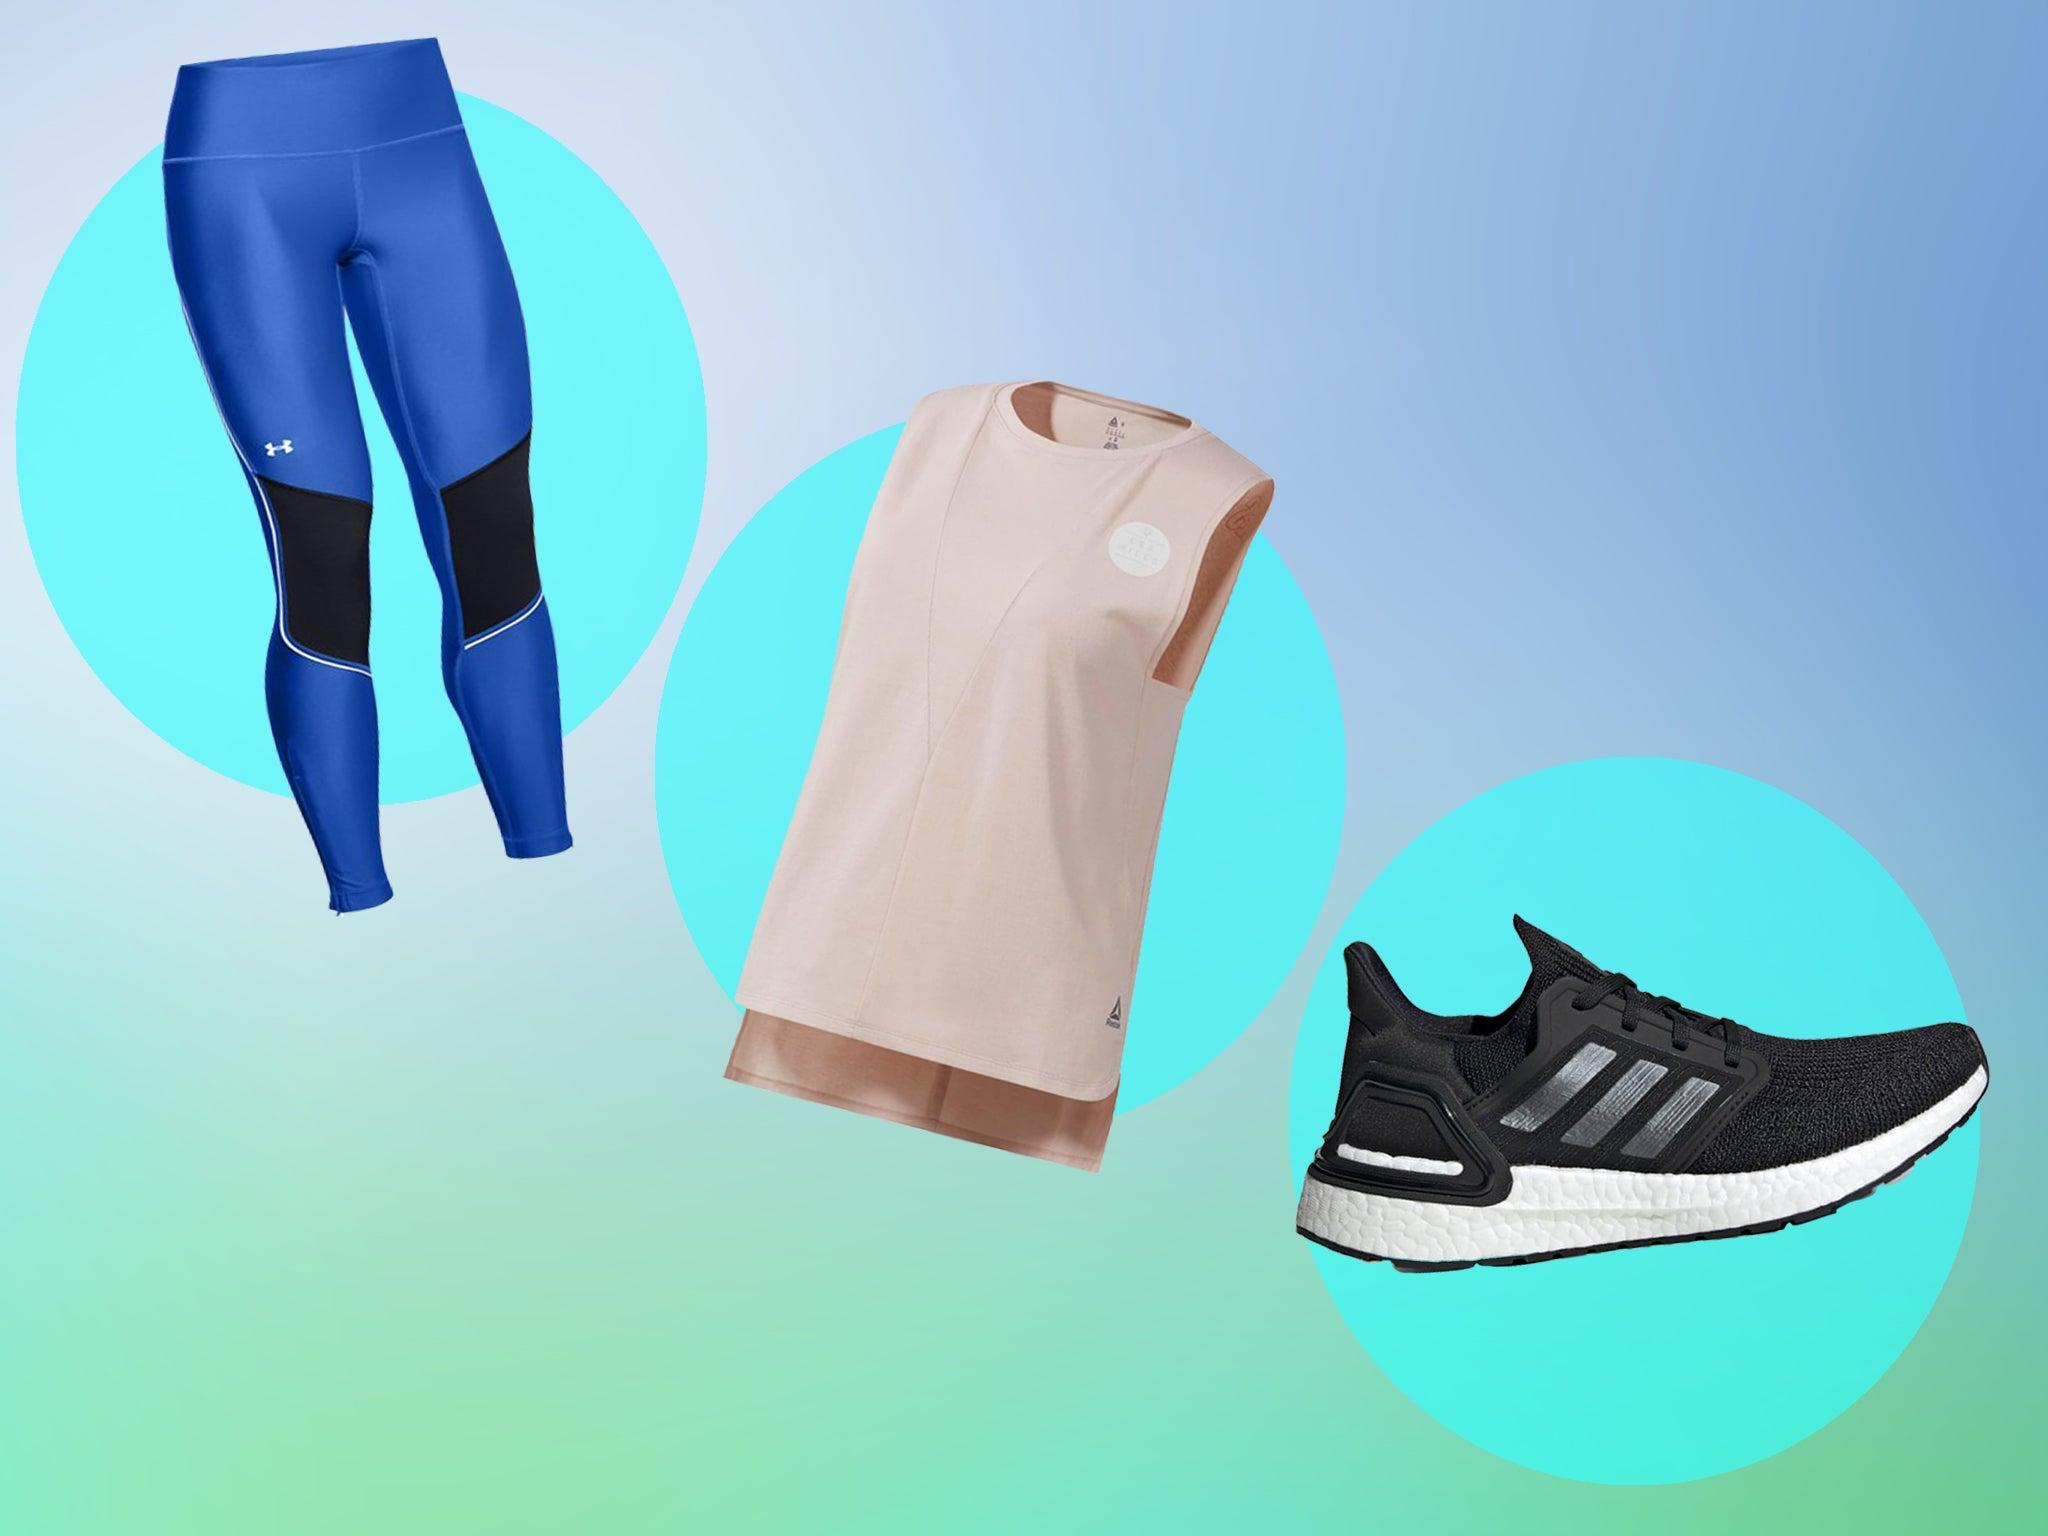 Gym wear 2020: Best discount codes from